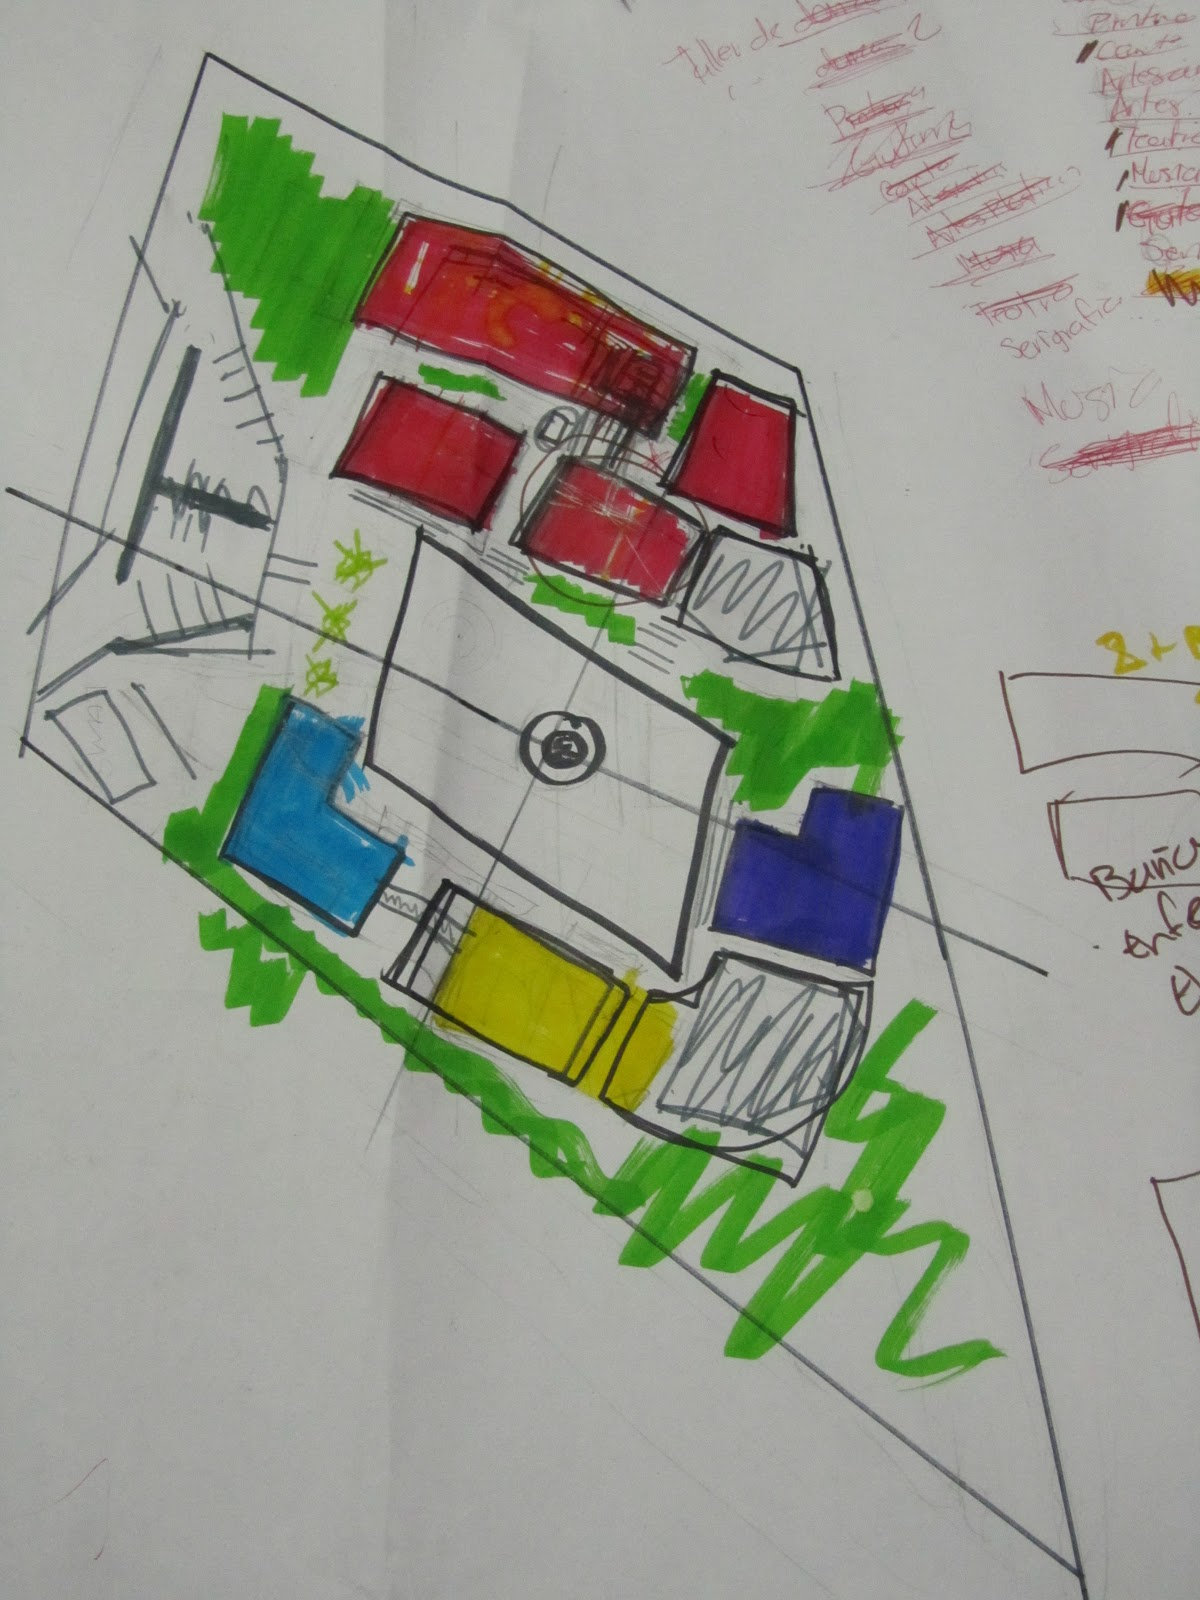 Proceso de dise o arquitect nico de un centro cultural for Que es diseno en arquitectura